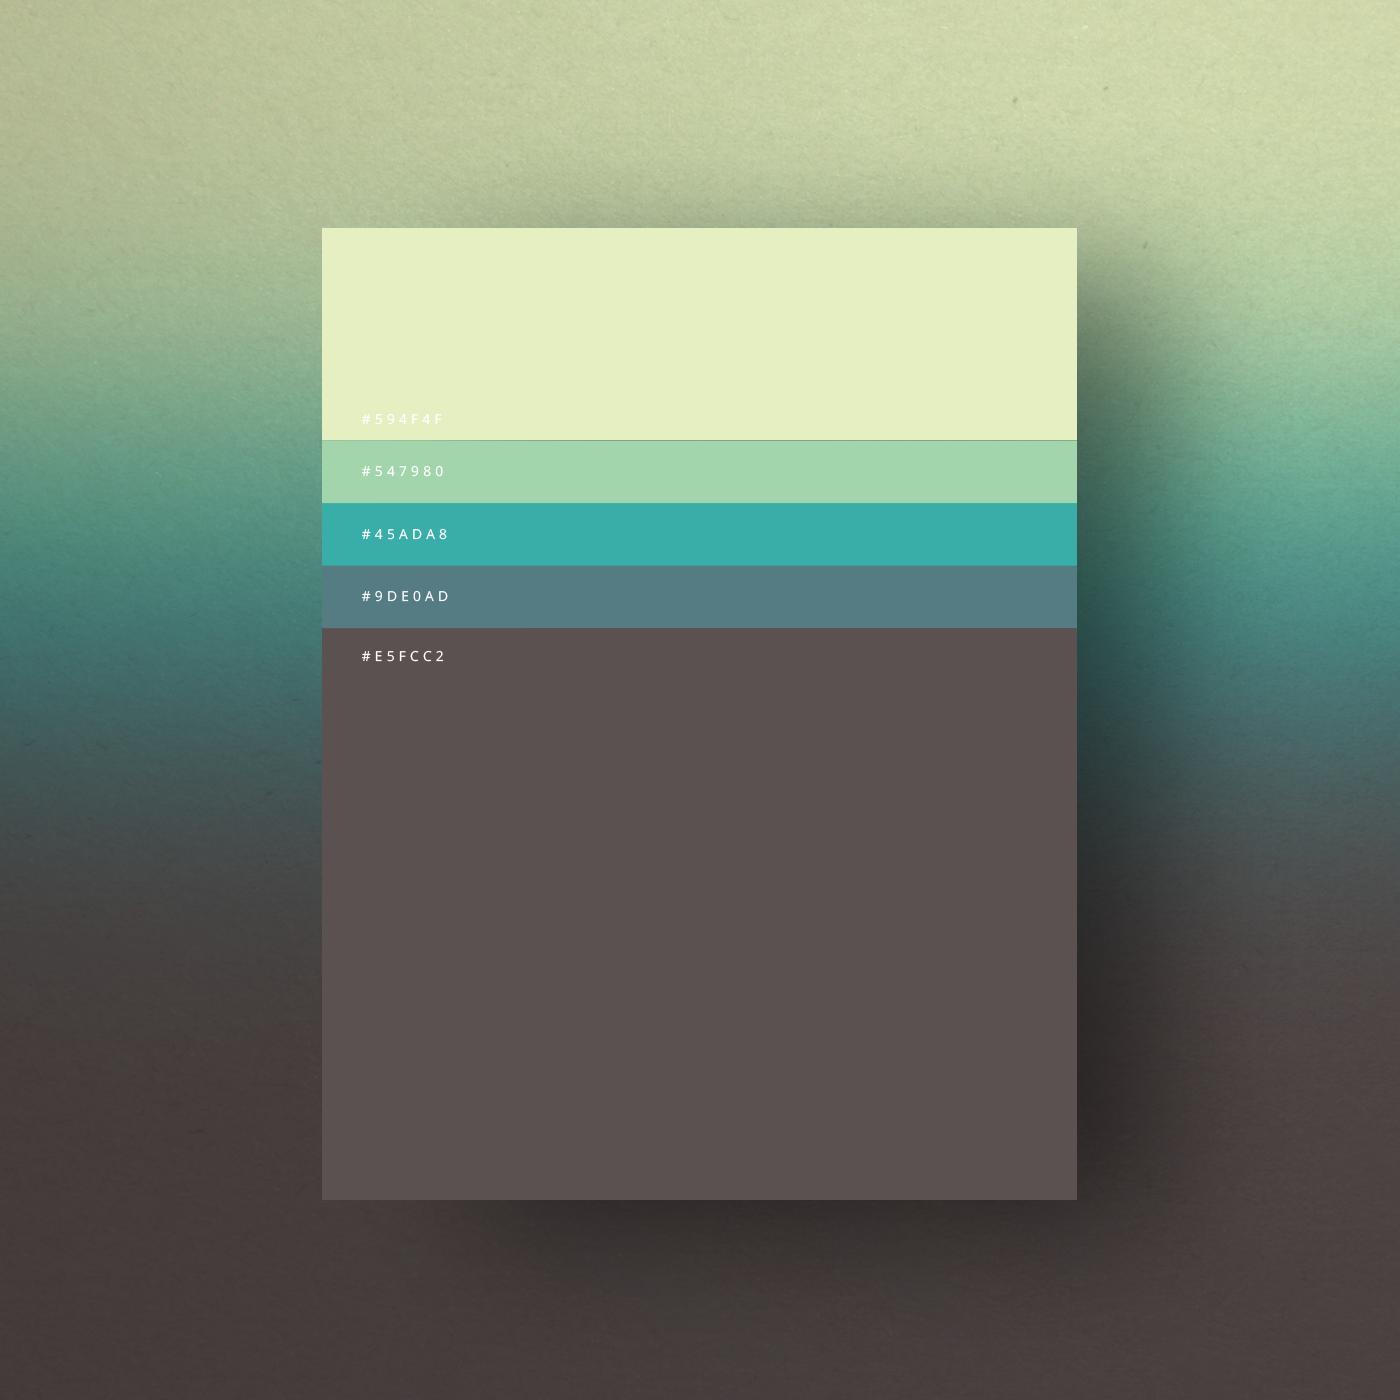 Web colors lime - Minimal Web Color Palettes Combination With Hex Code 7